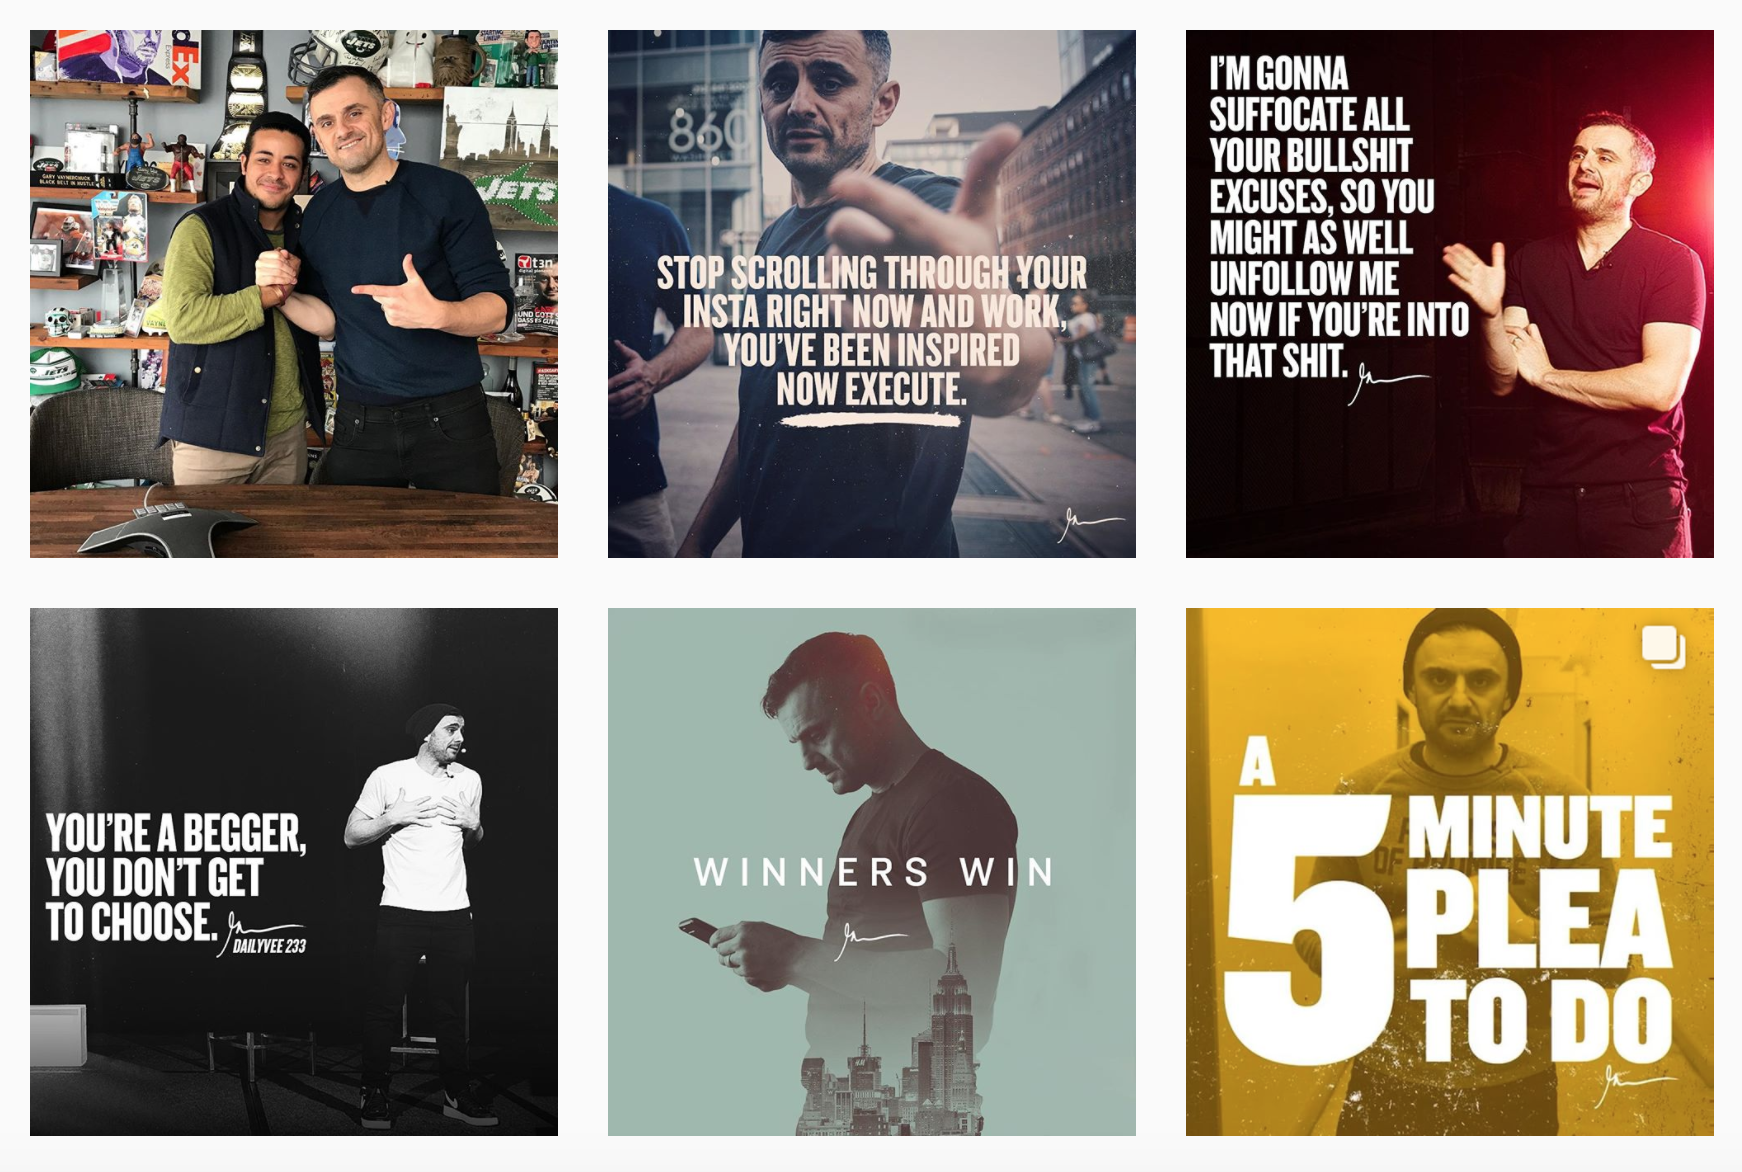 Gary Vaynerchuck on Instagram as @garyvee